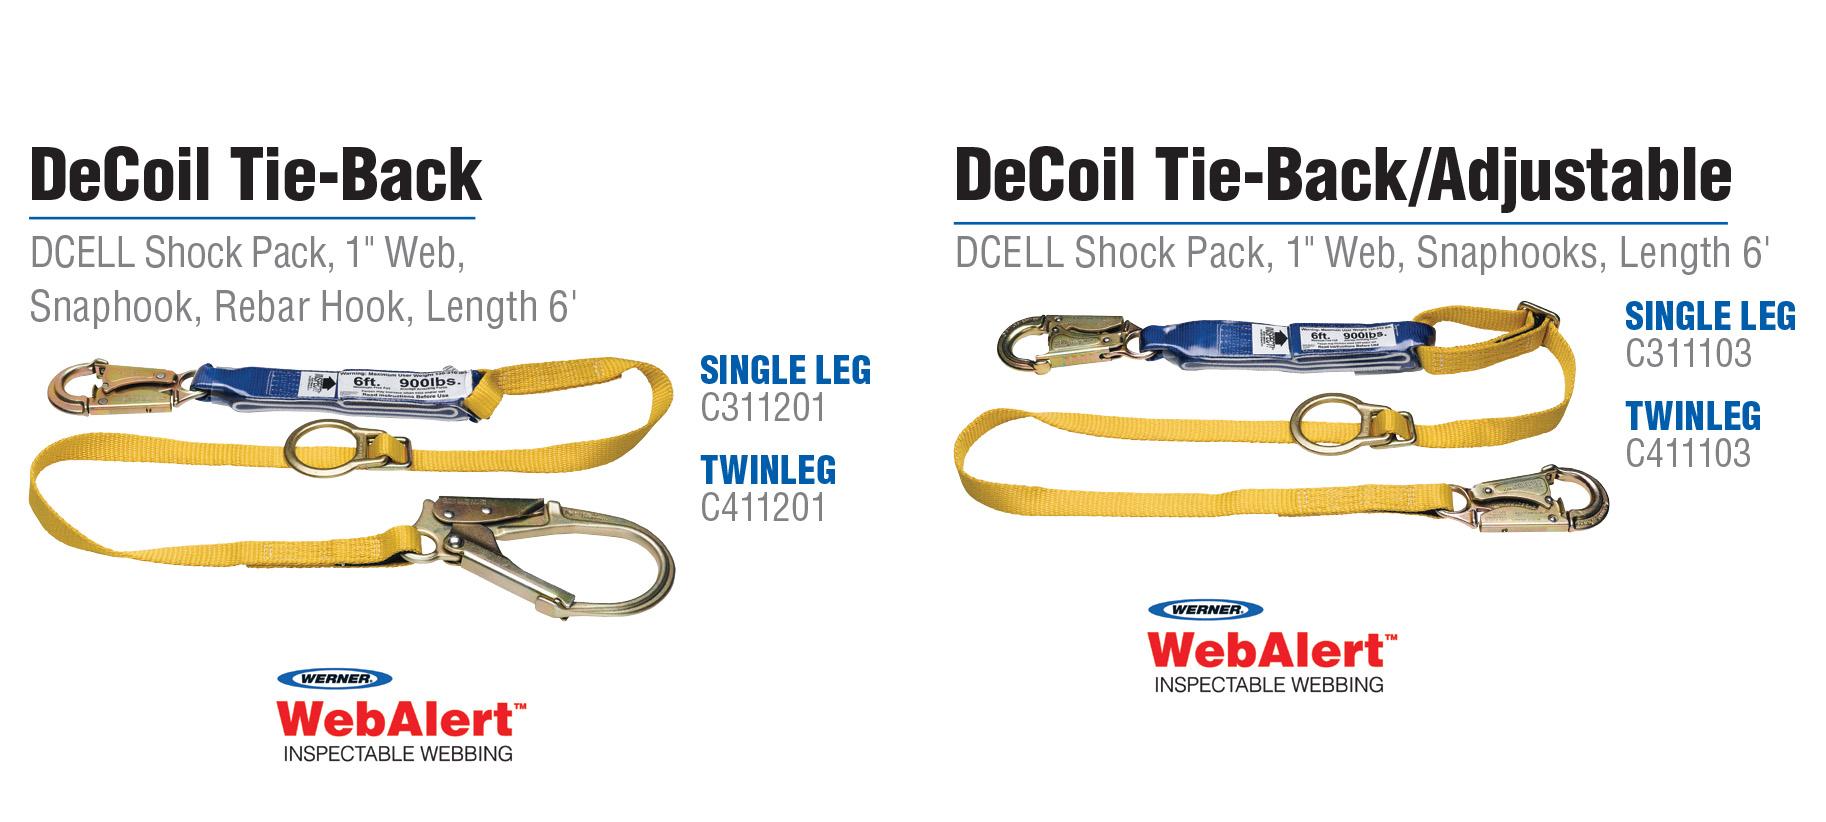 decoil-tie-back.jpg